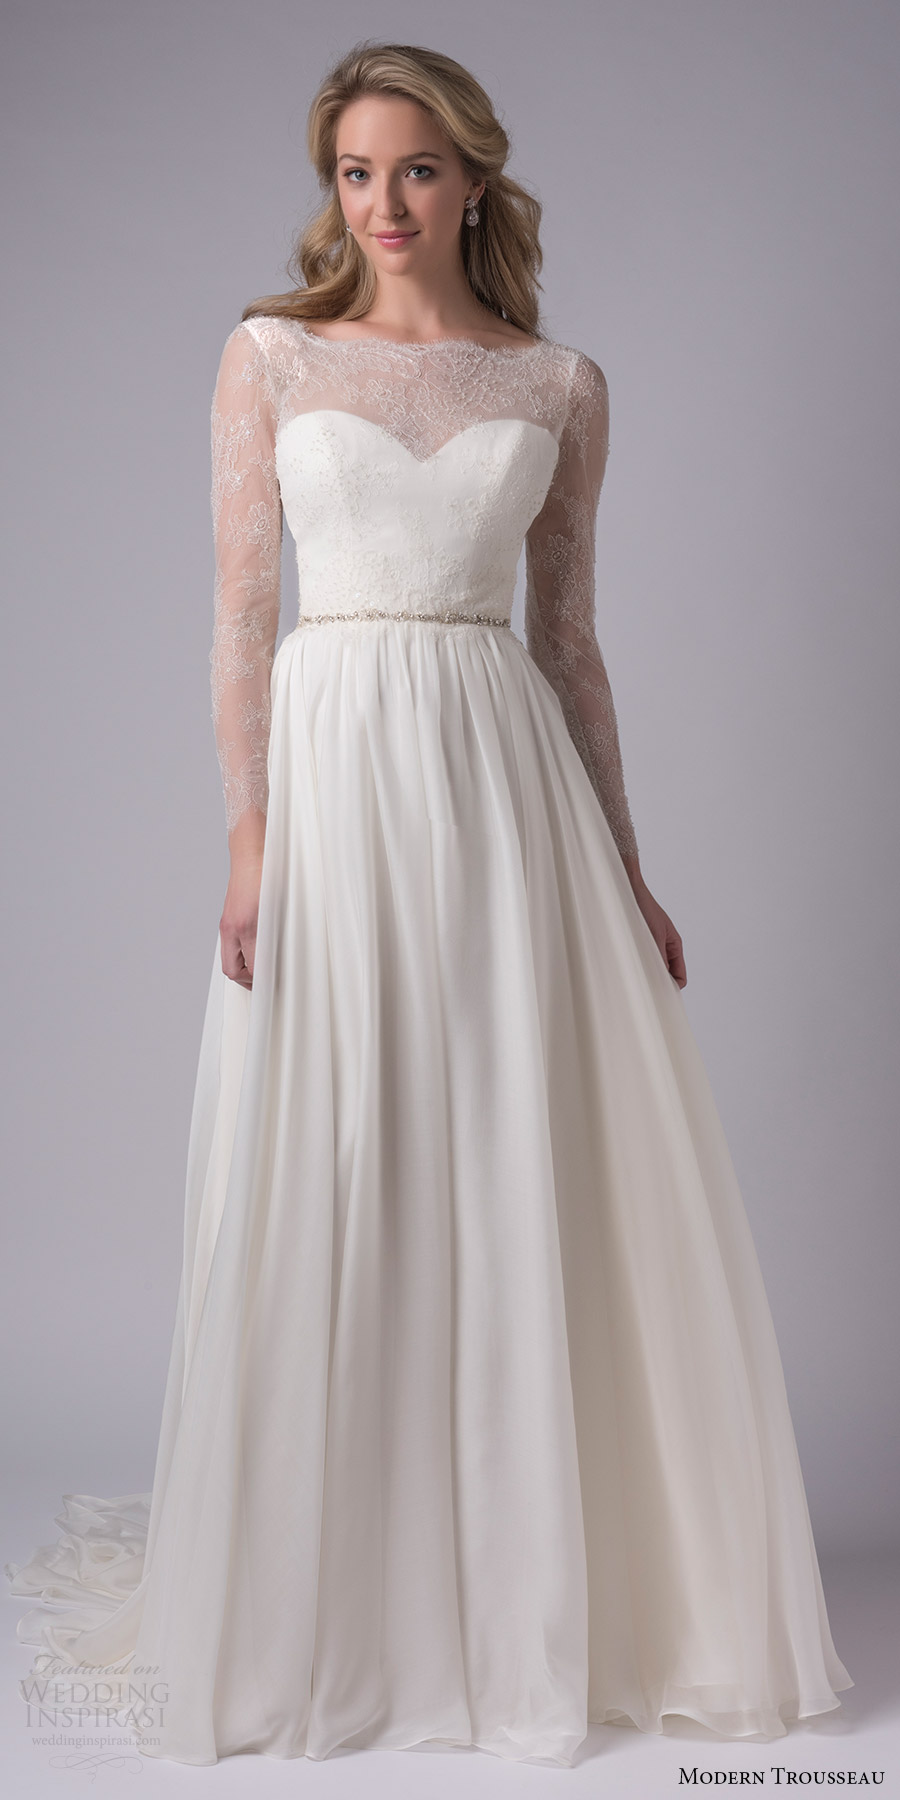 modern trousseau bridal fall 2017 illusion long sleeves sheer portrait sweetheart neckline aline wedding dress (lincoln) mv chapel train